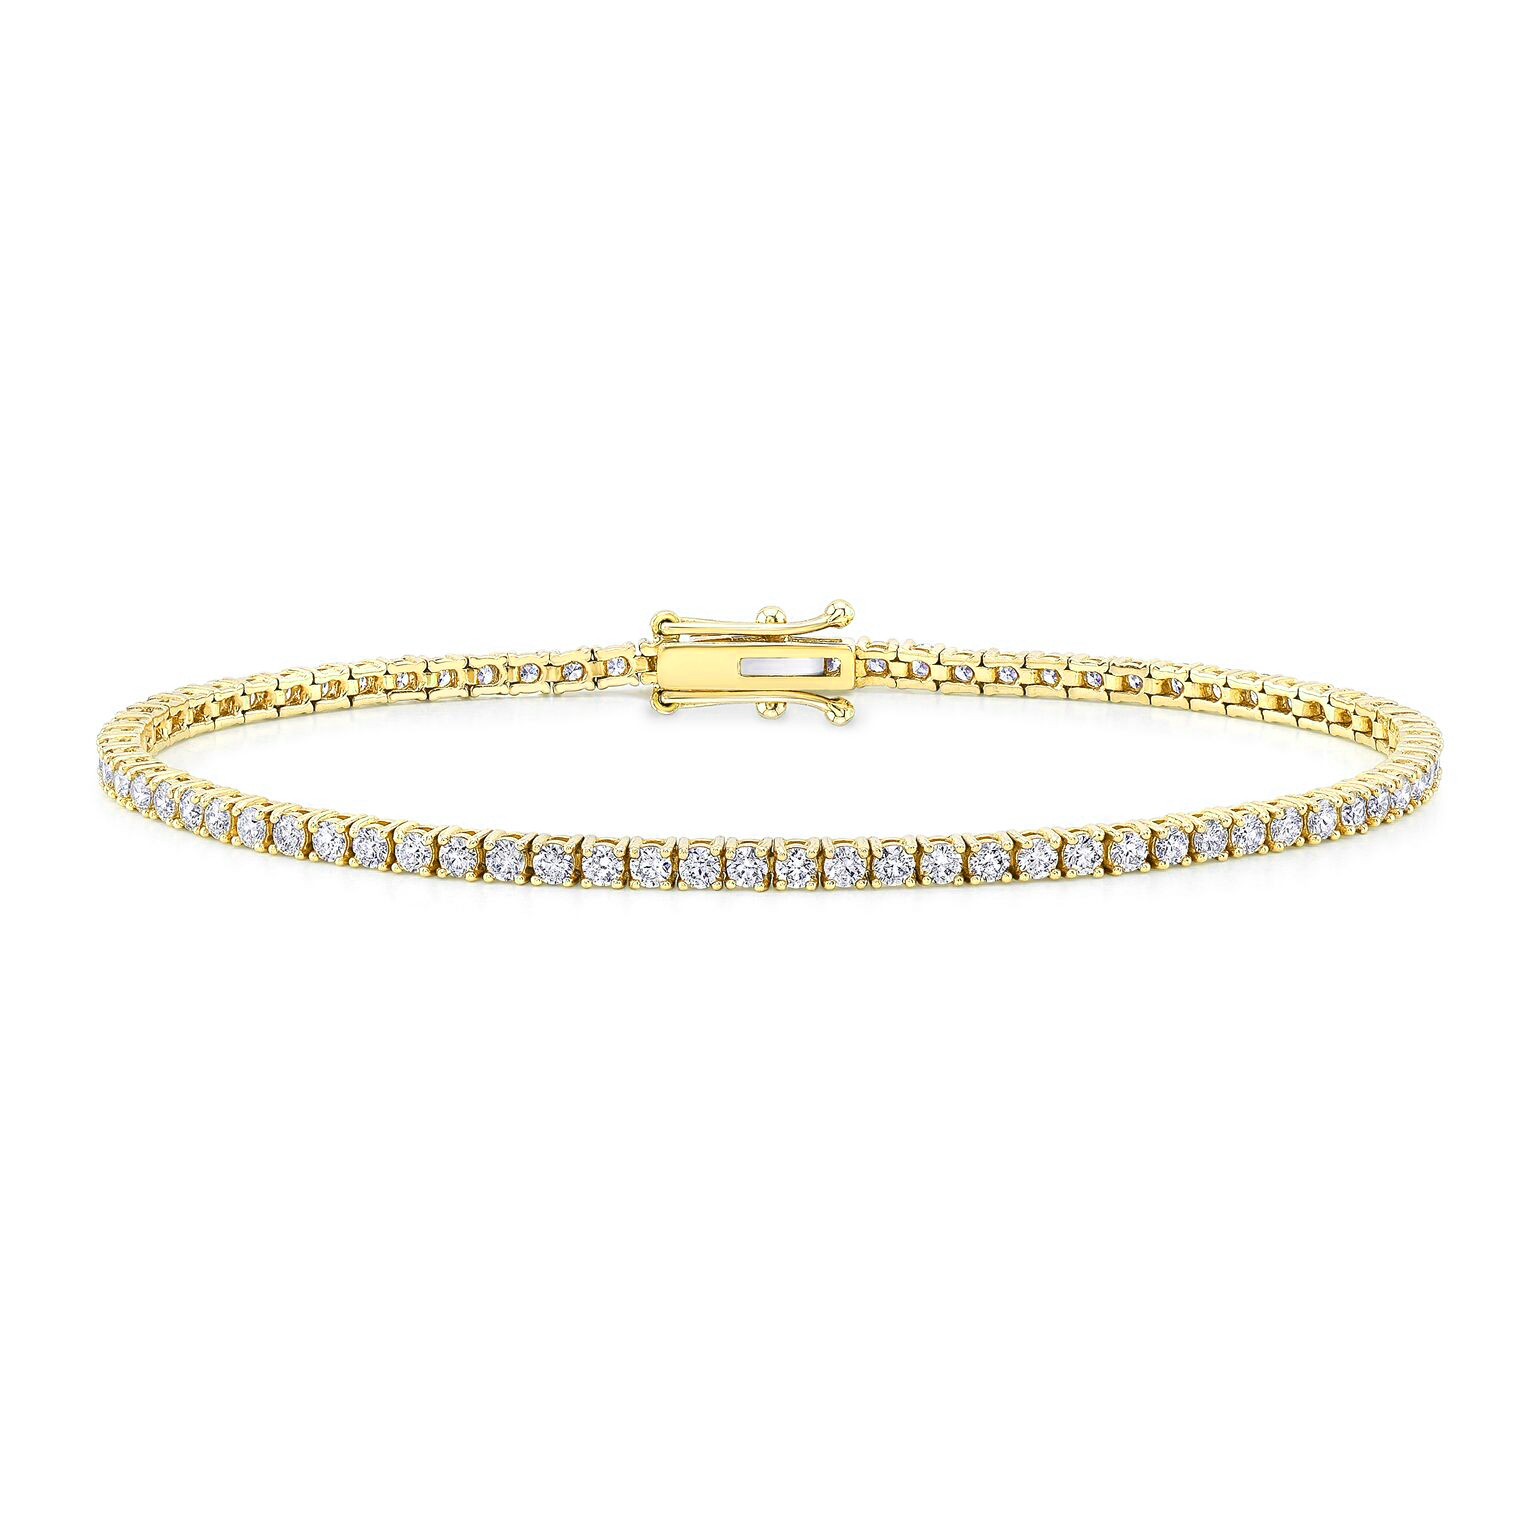 Charlize 2.32ct. Diamond Tennis Bracelet